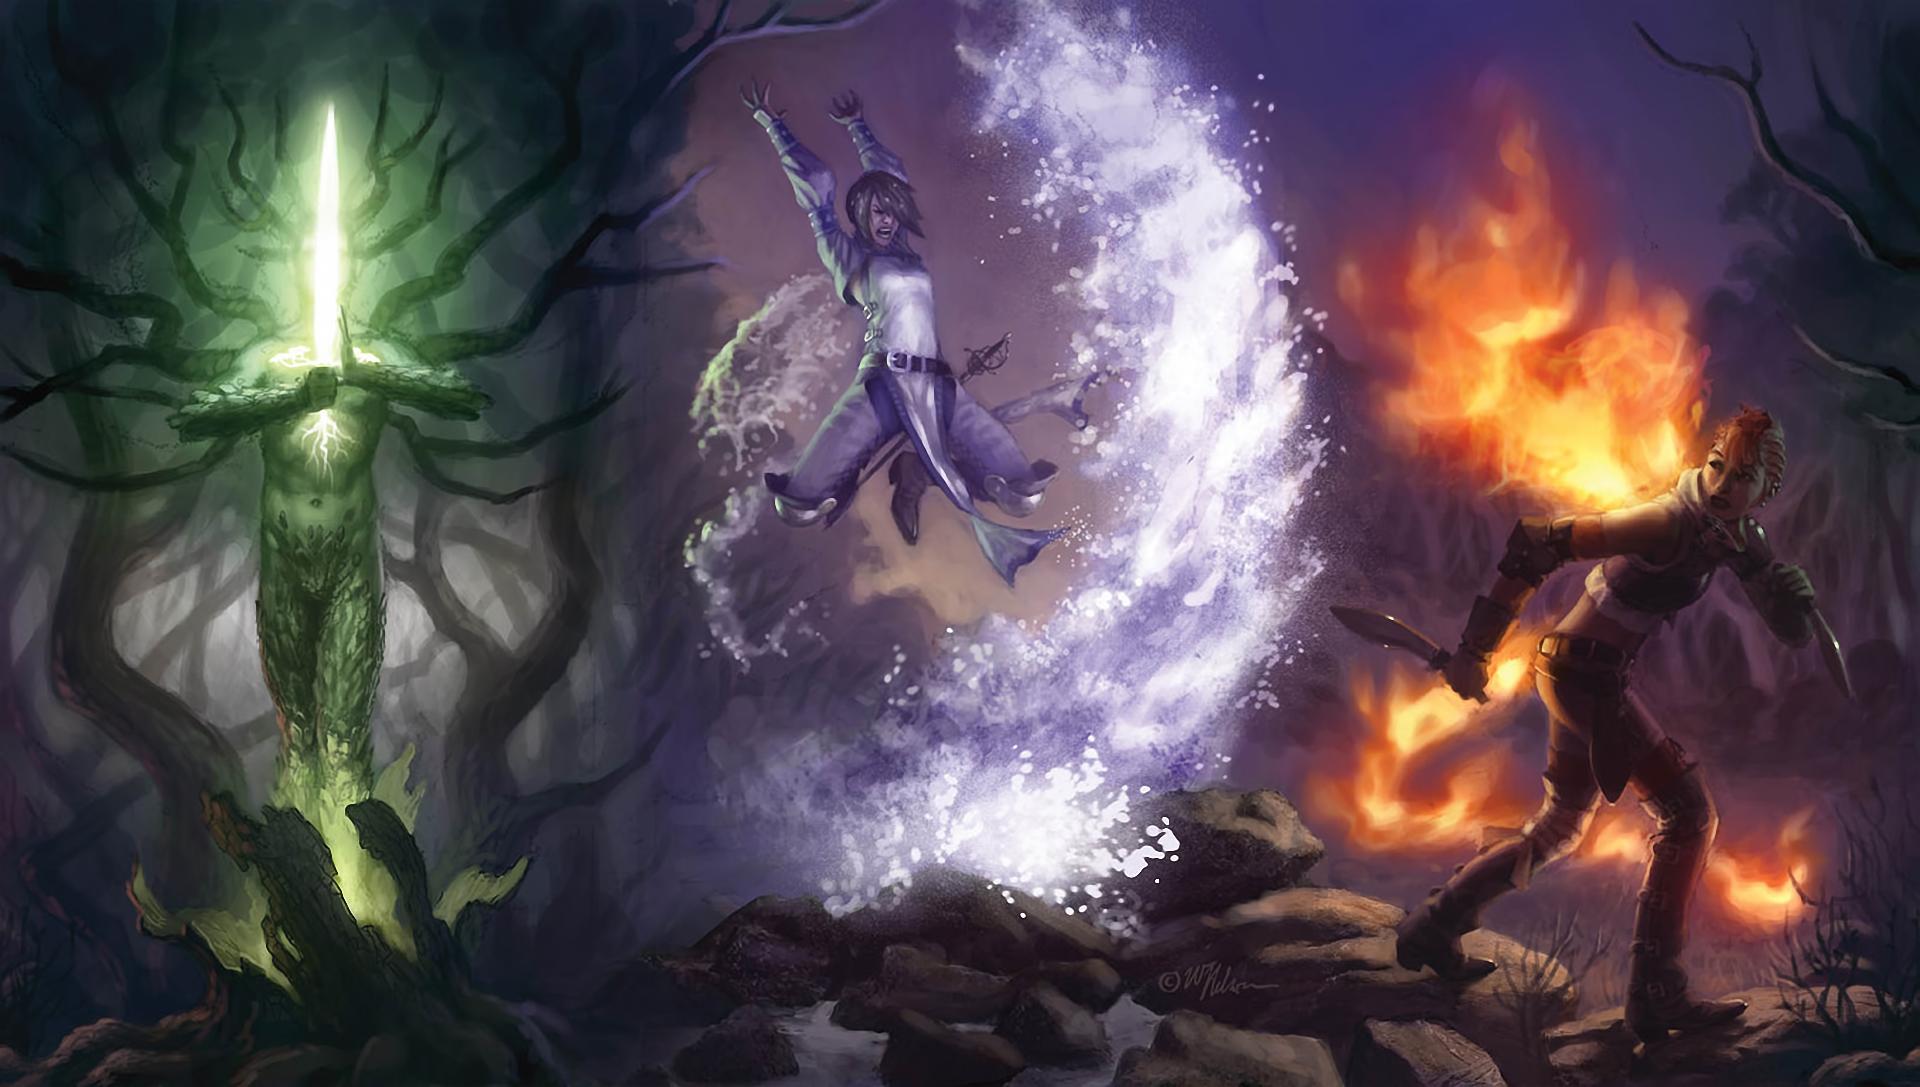 Fantasy Wizard Background 1 Hd Wallpapers: Comicon HD Wallpaper